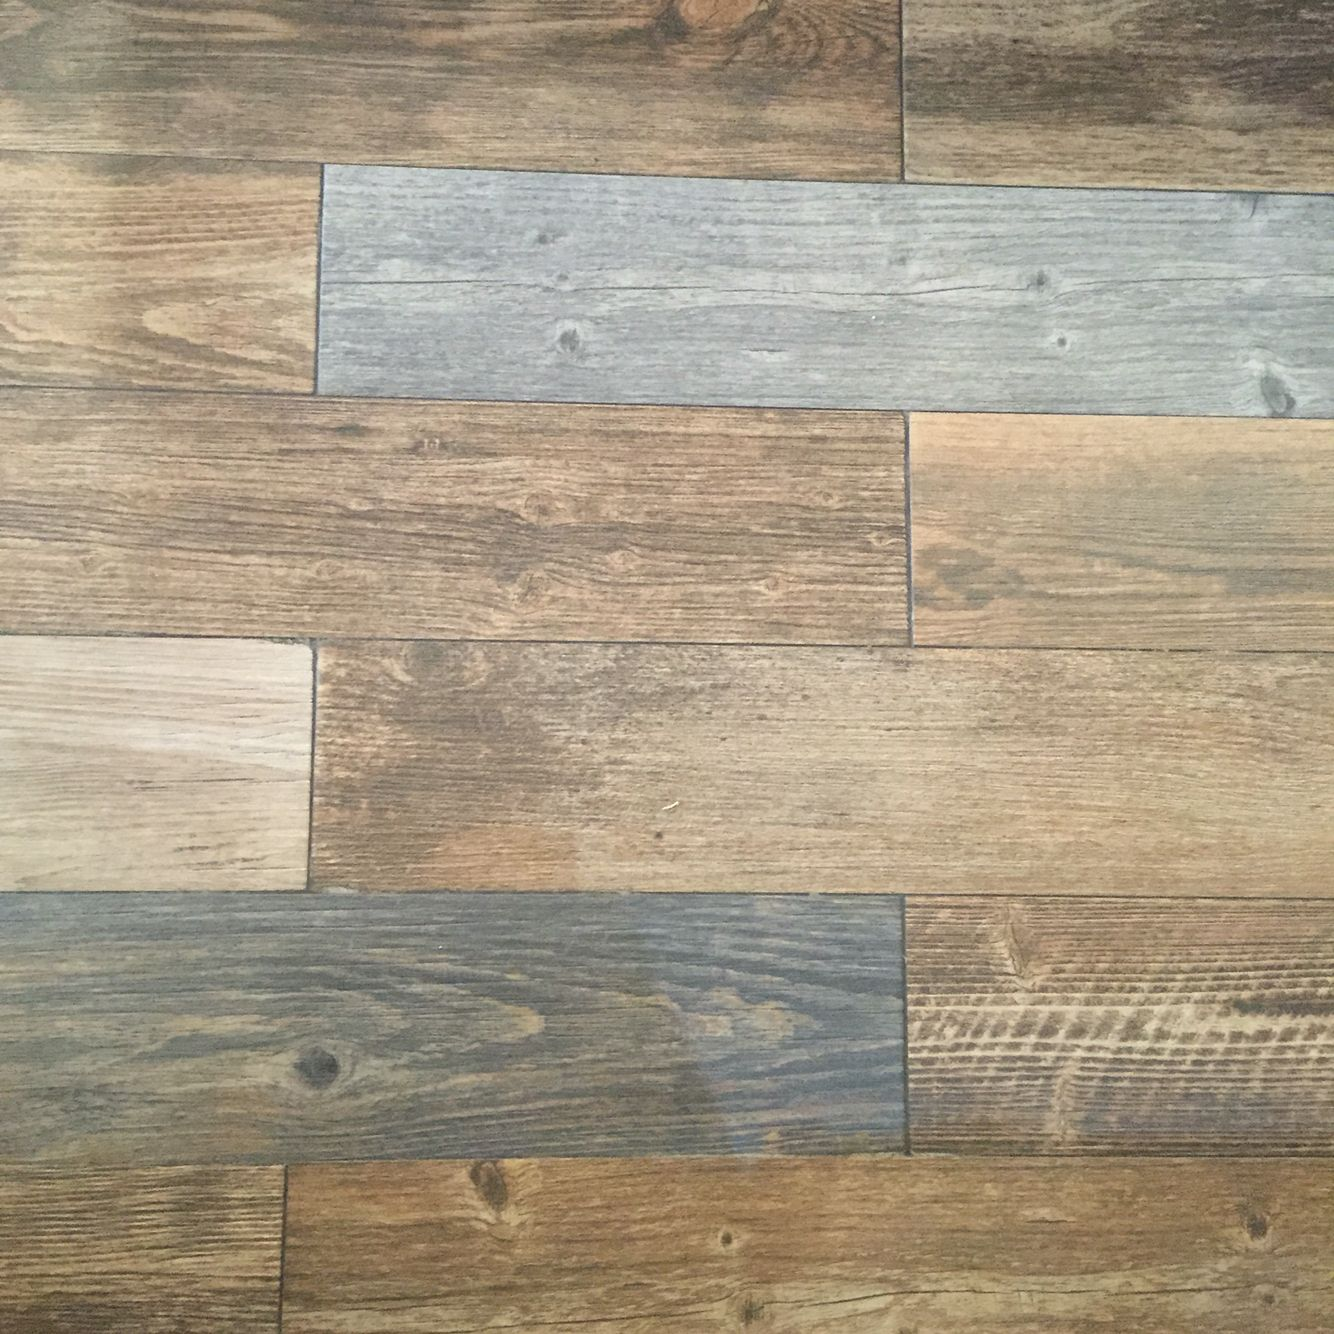 Piso de cermica imitacin madera  Textures in 2019